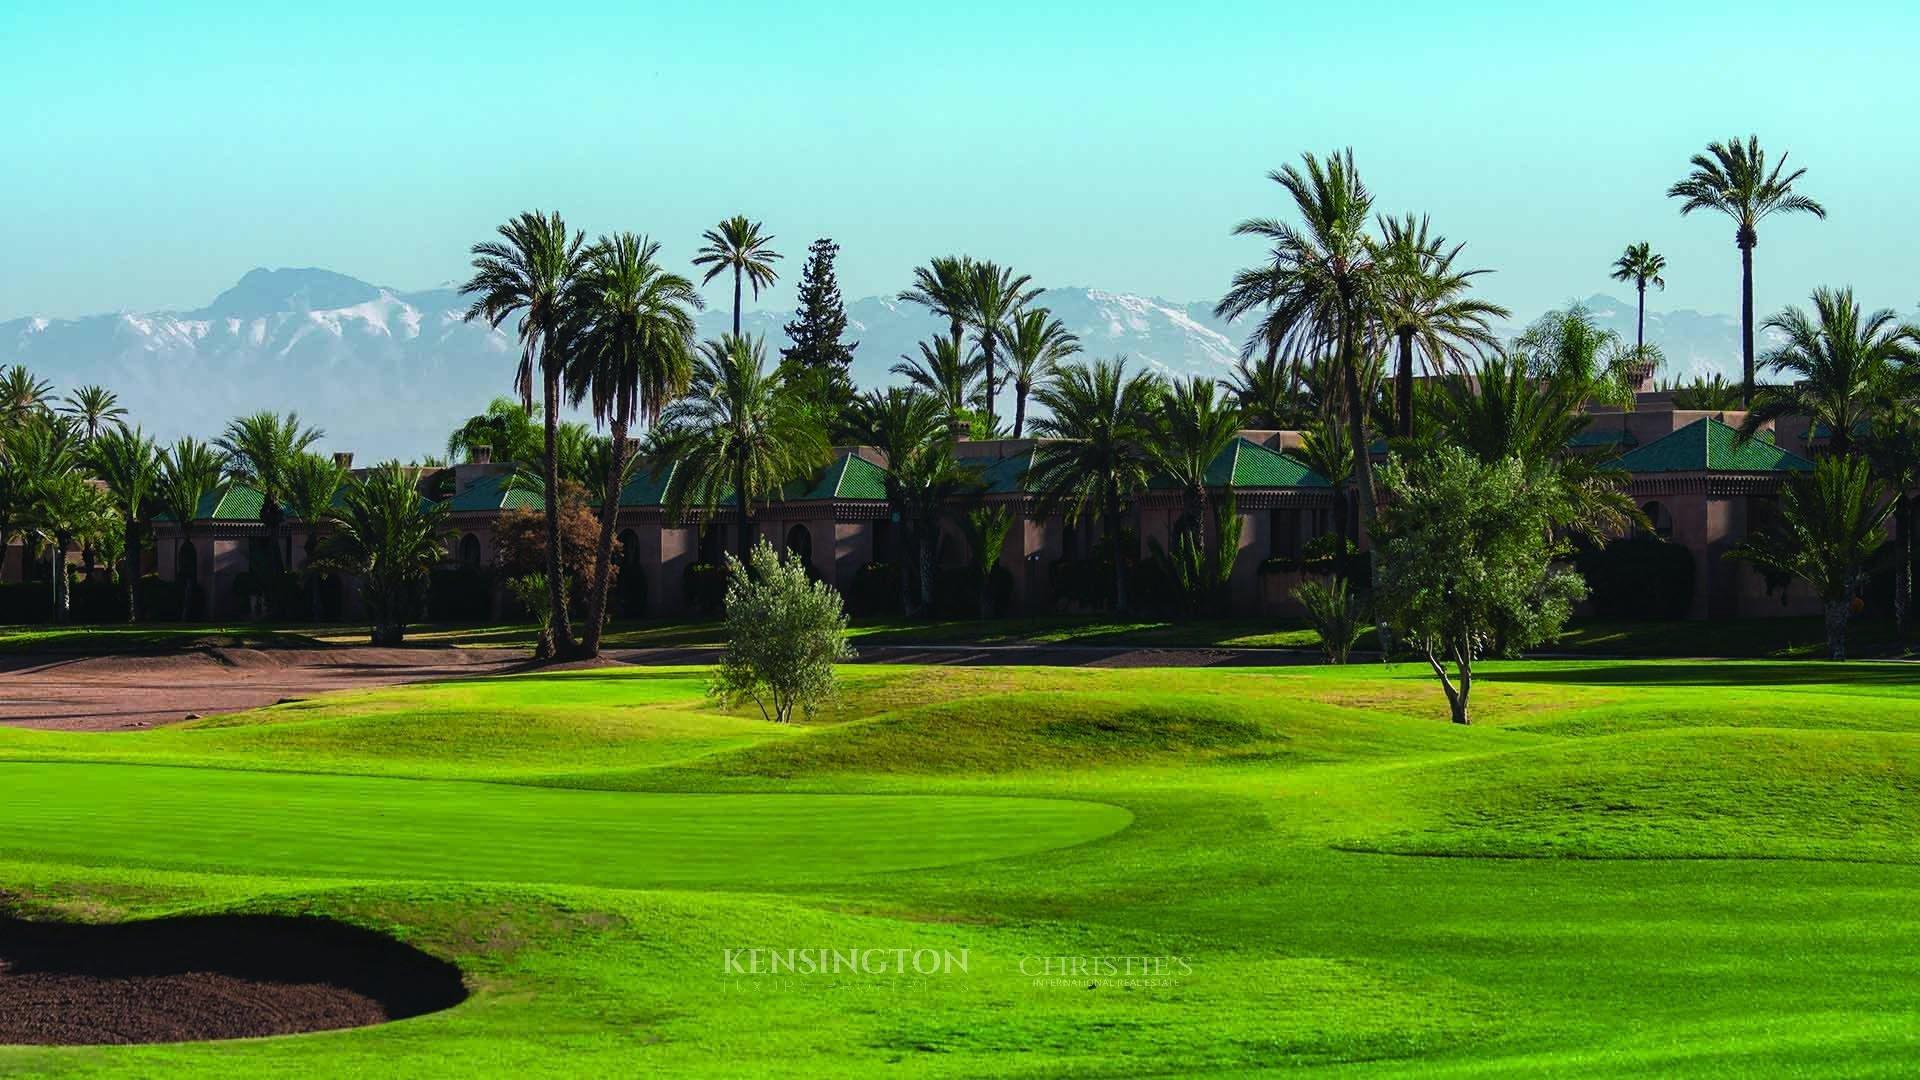 KPPM01193: Buildind land Amara Building land Marrakech Morocco